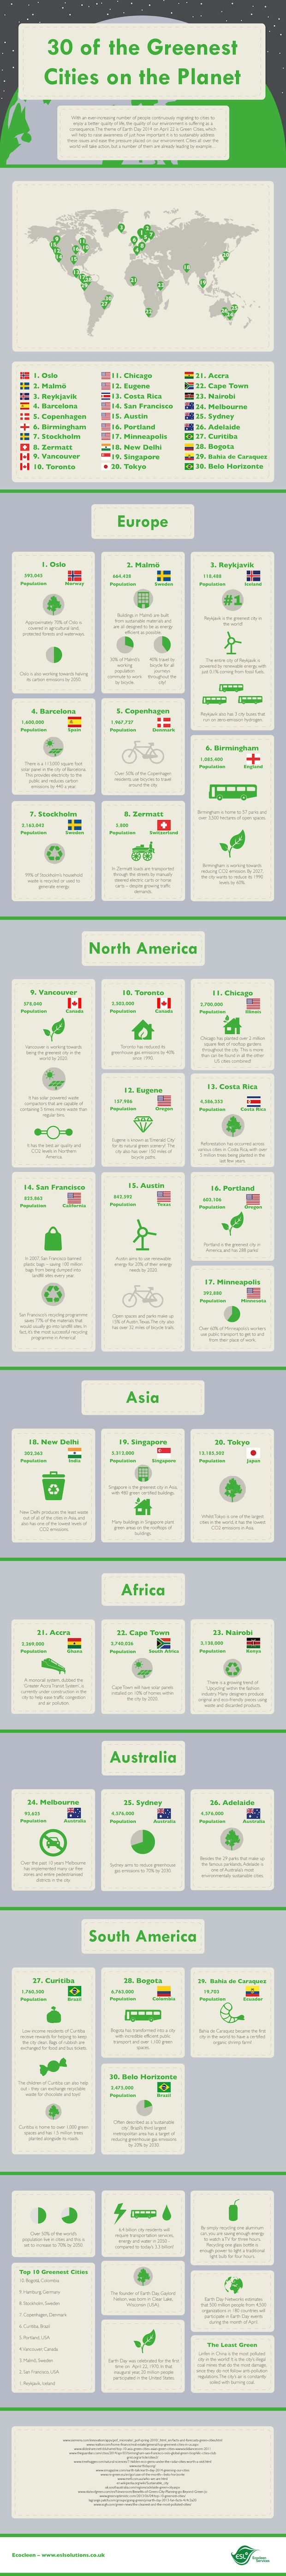 ECO_Infographic_Greenest_Cities.jpg